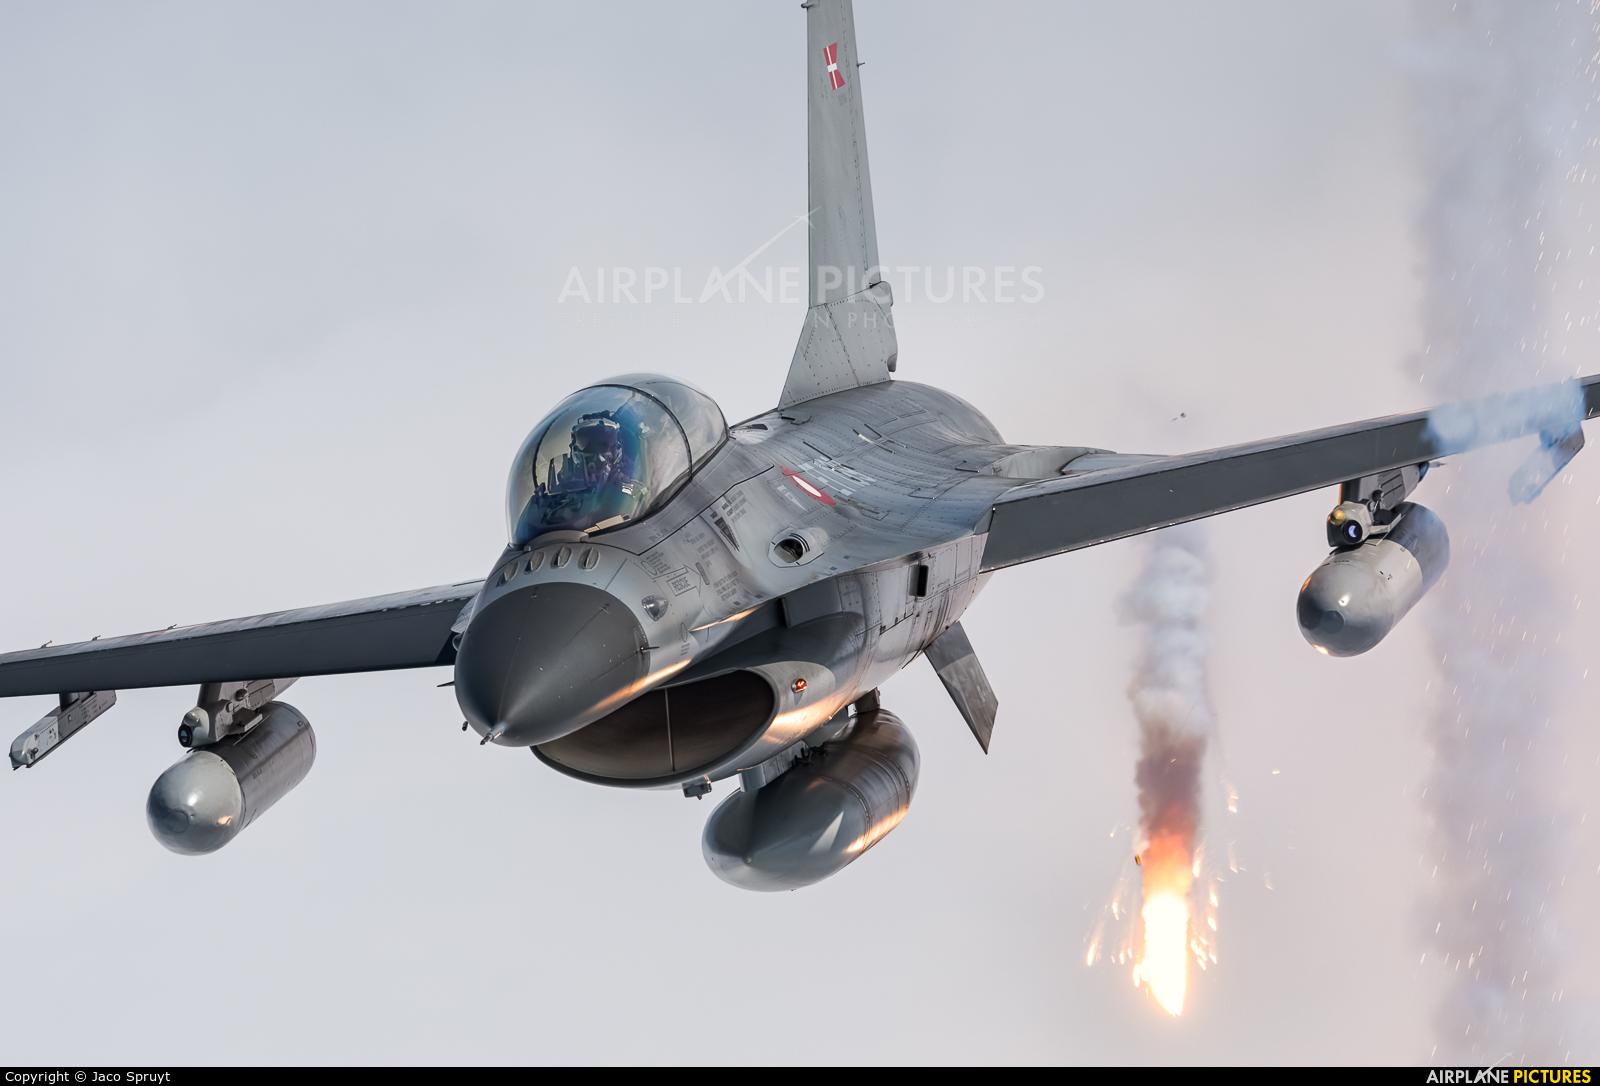 Denmark - Air Force ET-199 aircraft at In Flight - Belgium